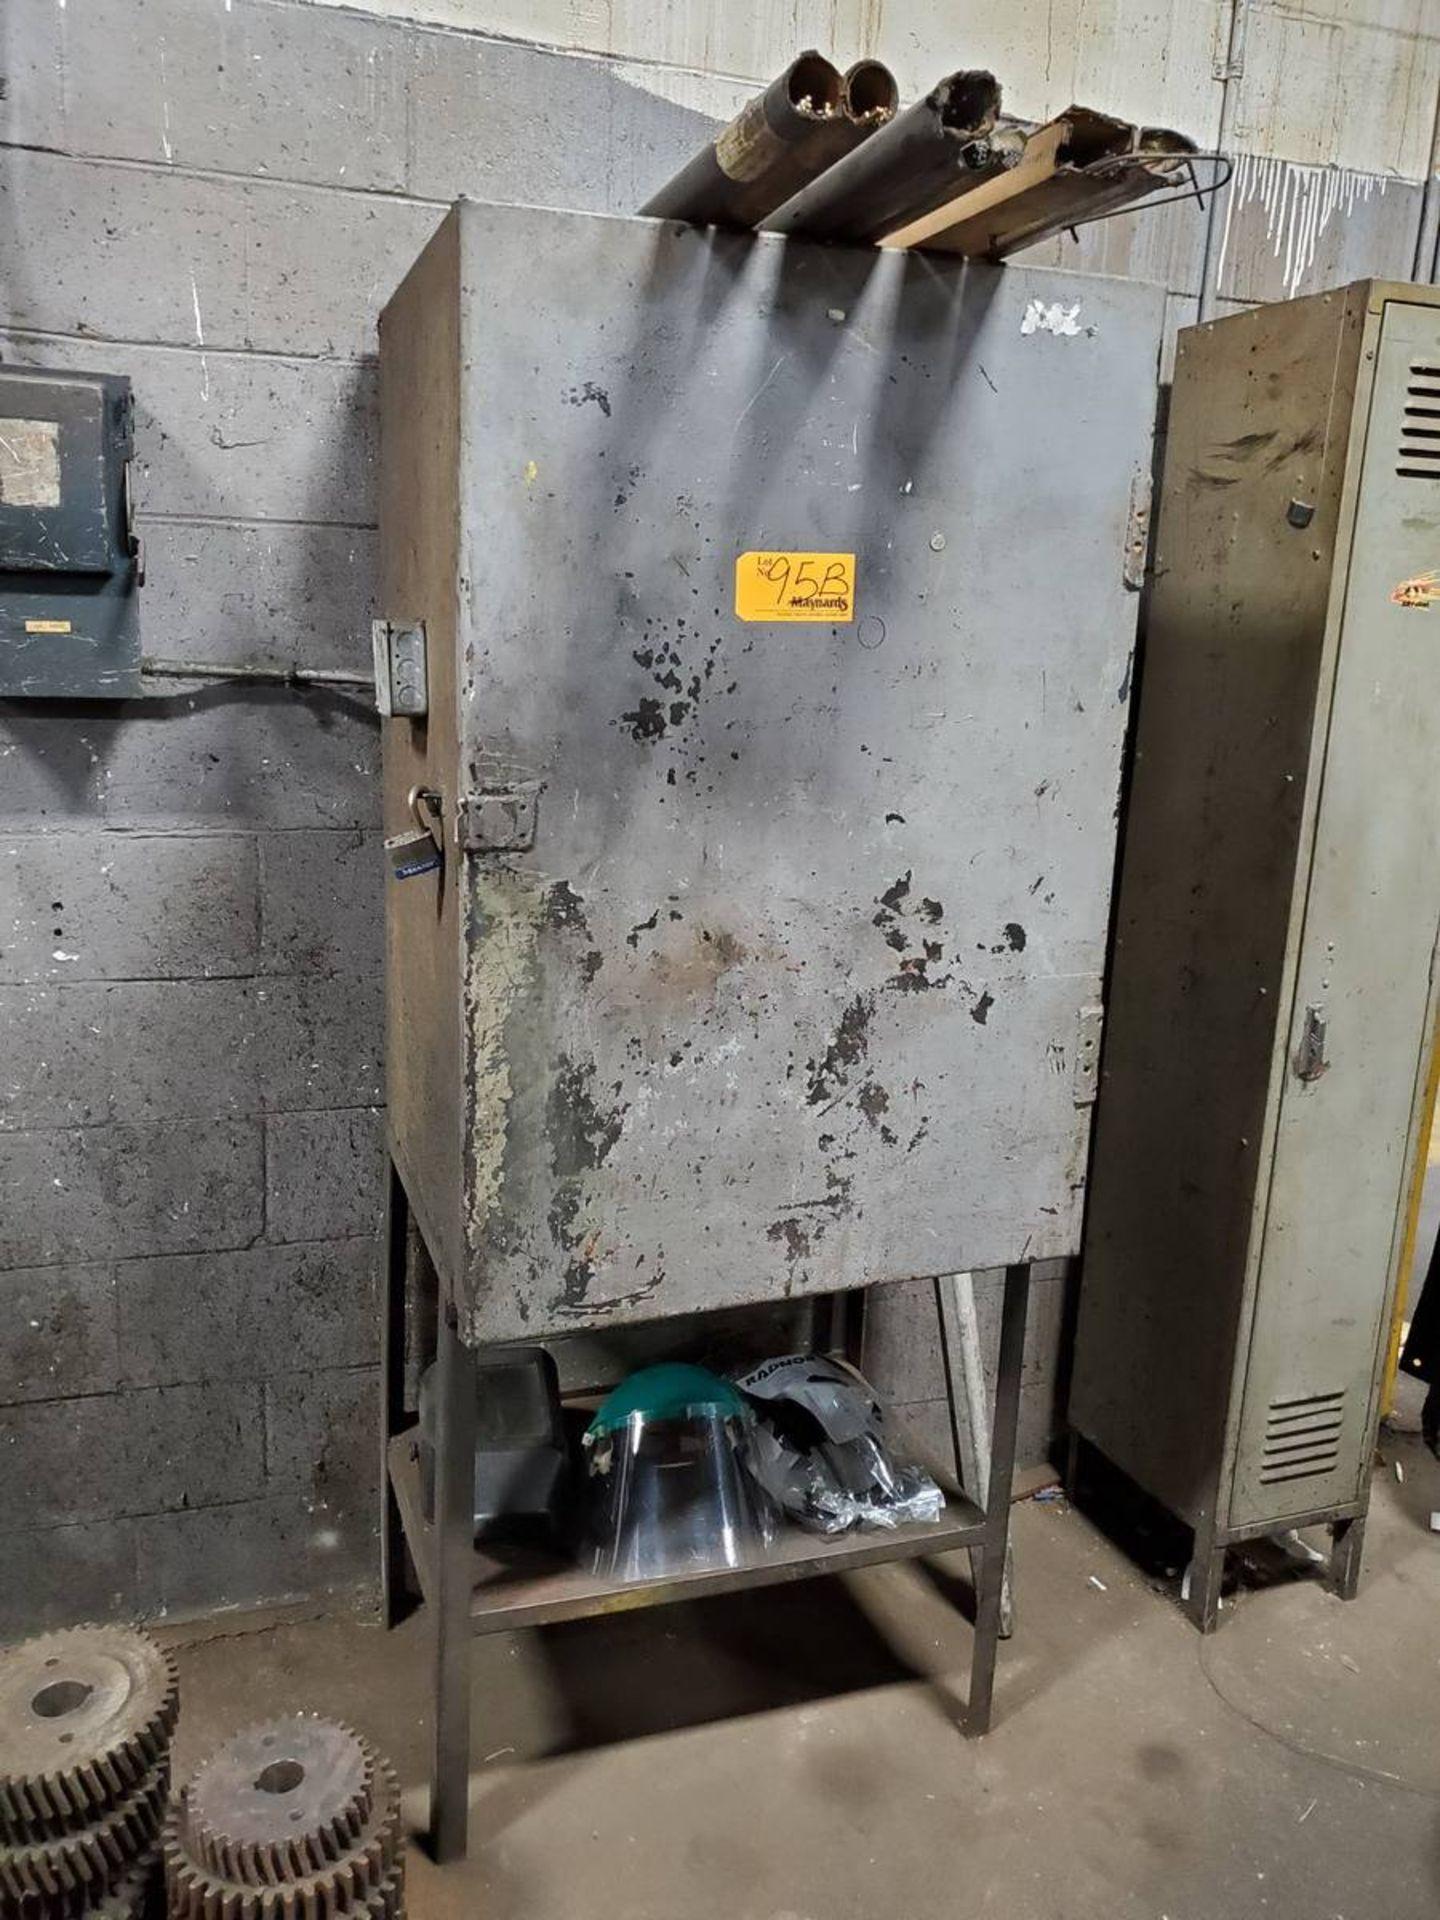 Lot 95B - Metal Welding Storage Locker W/ Contents